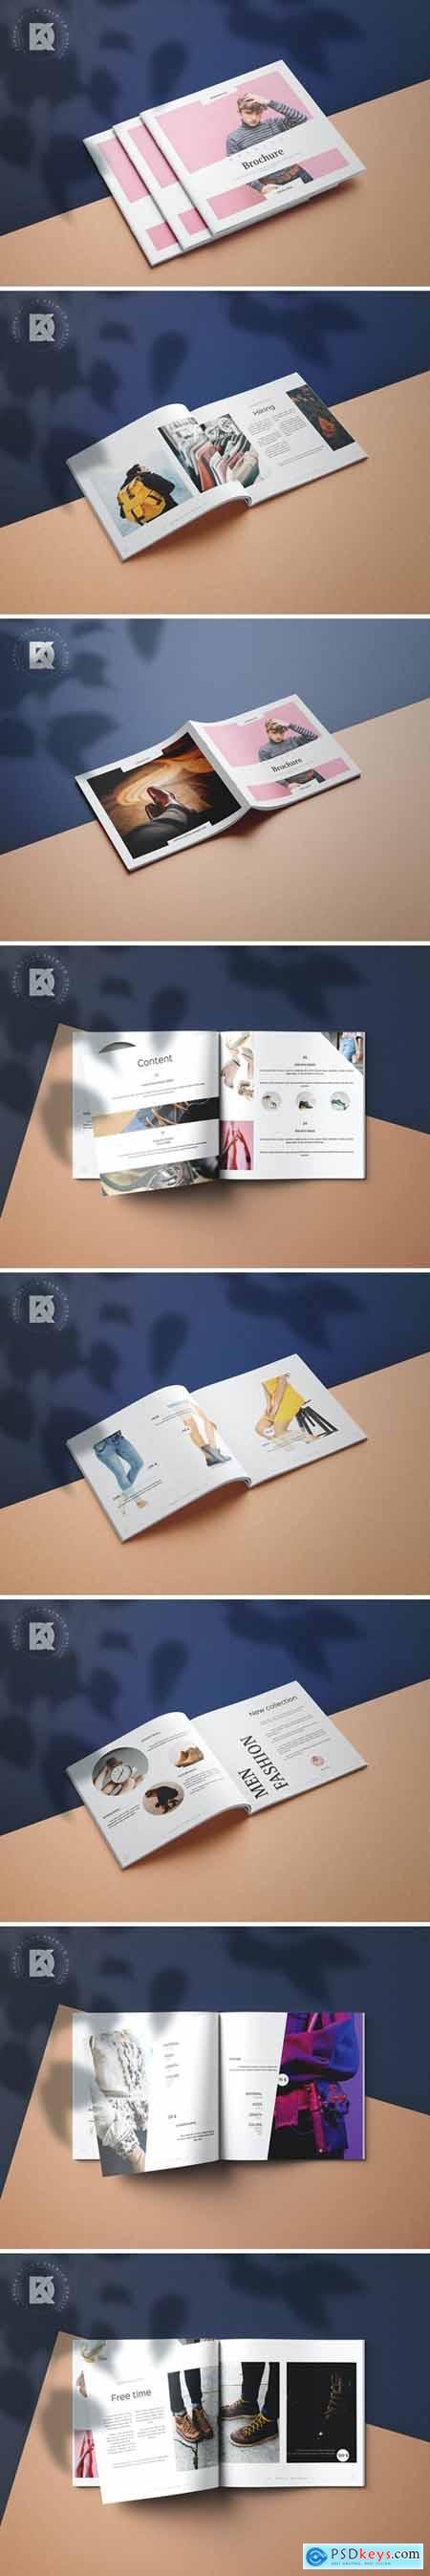 Product Brochure - Catalog